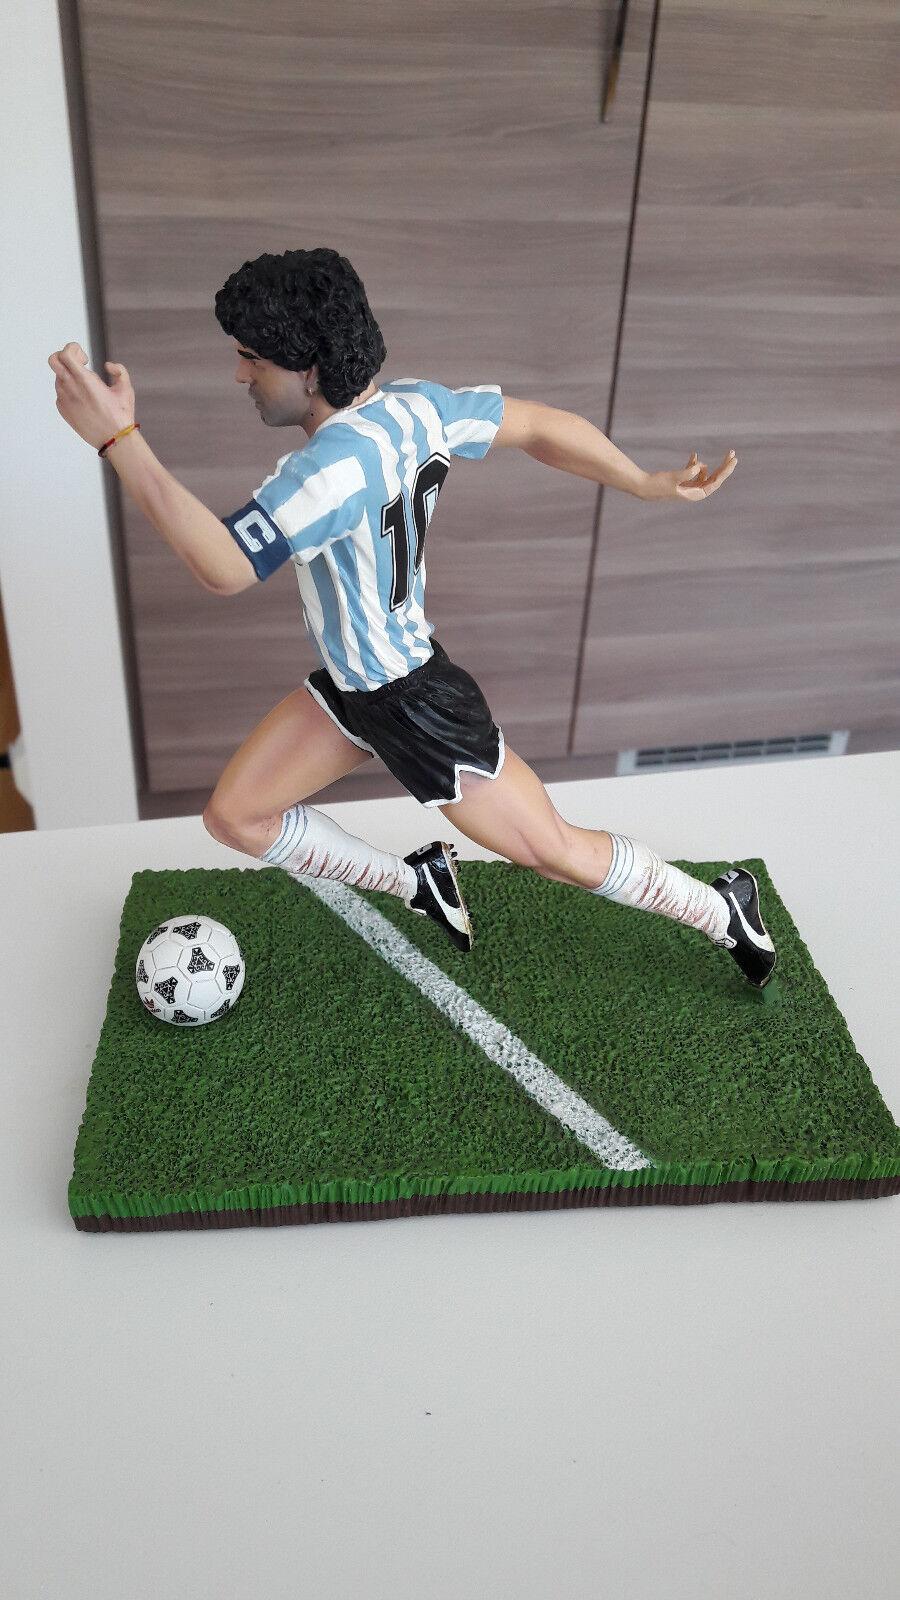 Diego Maradona figure 9  fanatico futbol Soccer NO ftchamps 602   5000 Limited